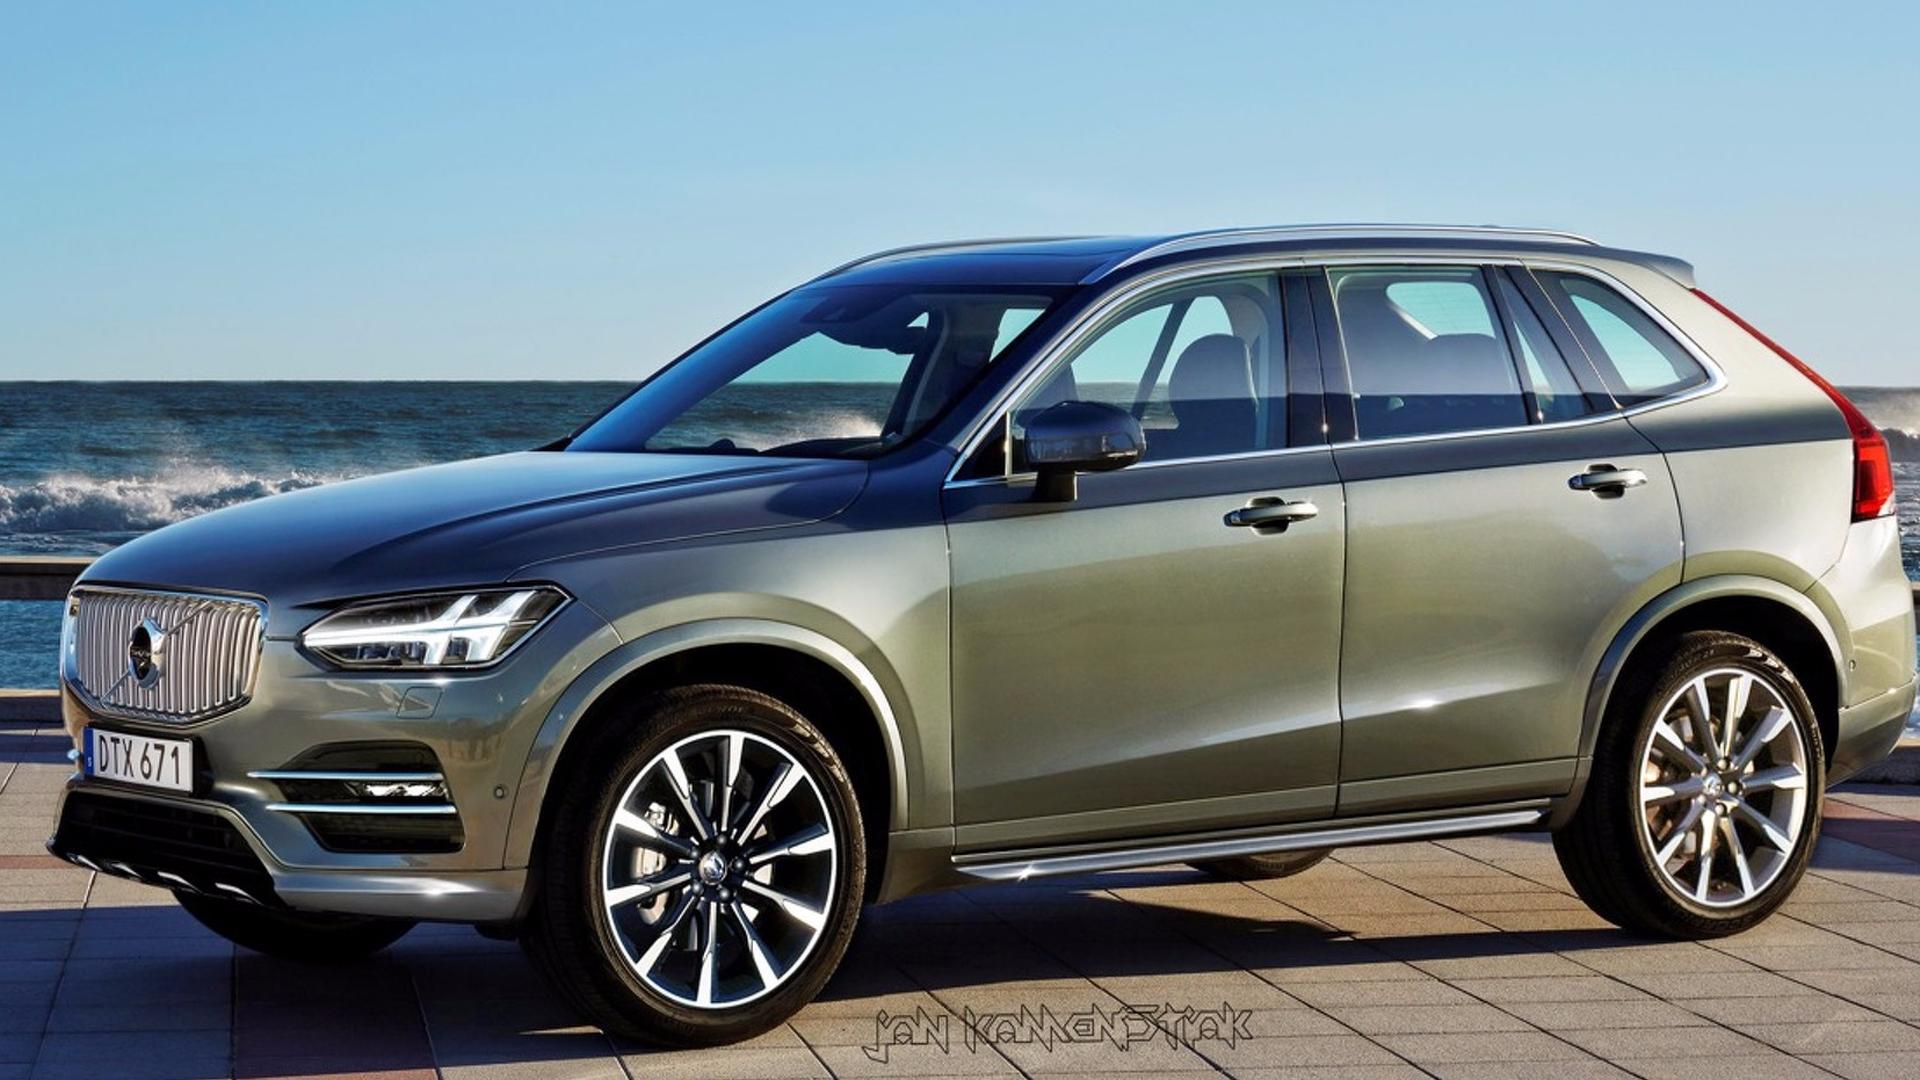 New Volvo Suv Xc60 >> Next-gen Volvo XC60 rendered as baby XC90